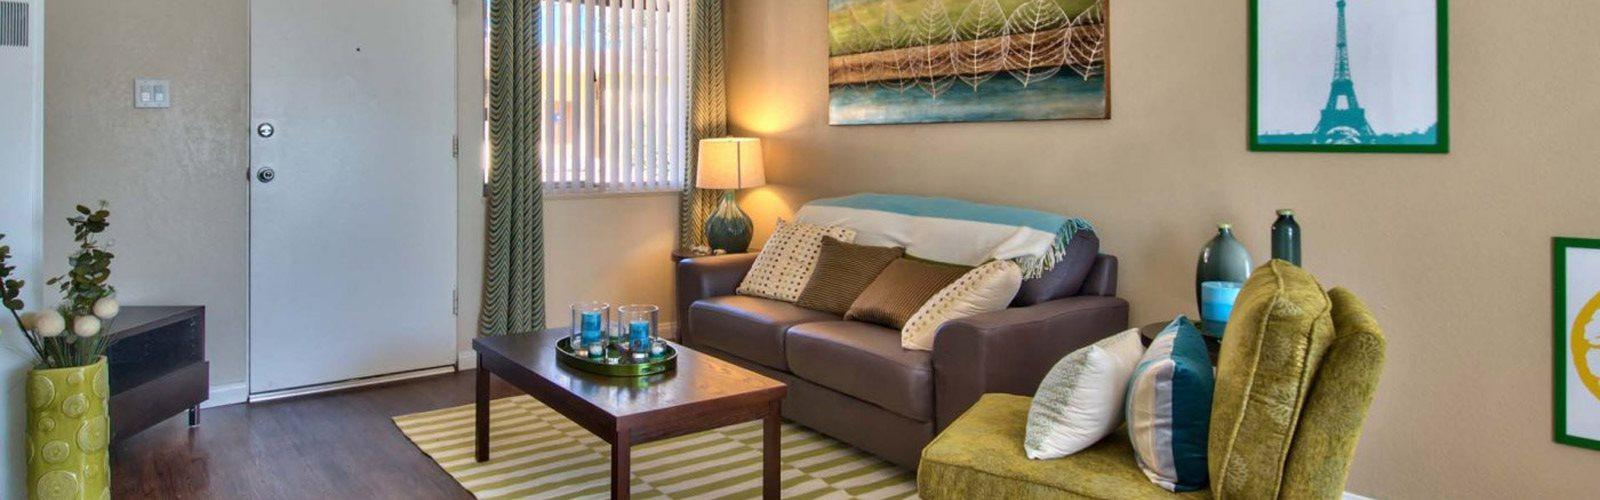 Ontario, Ca 91761 Apts for rent l The Casitas Apartments